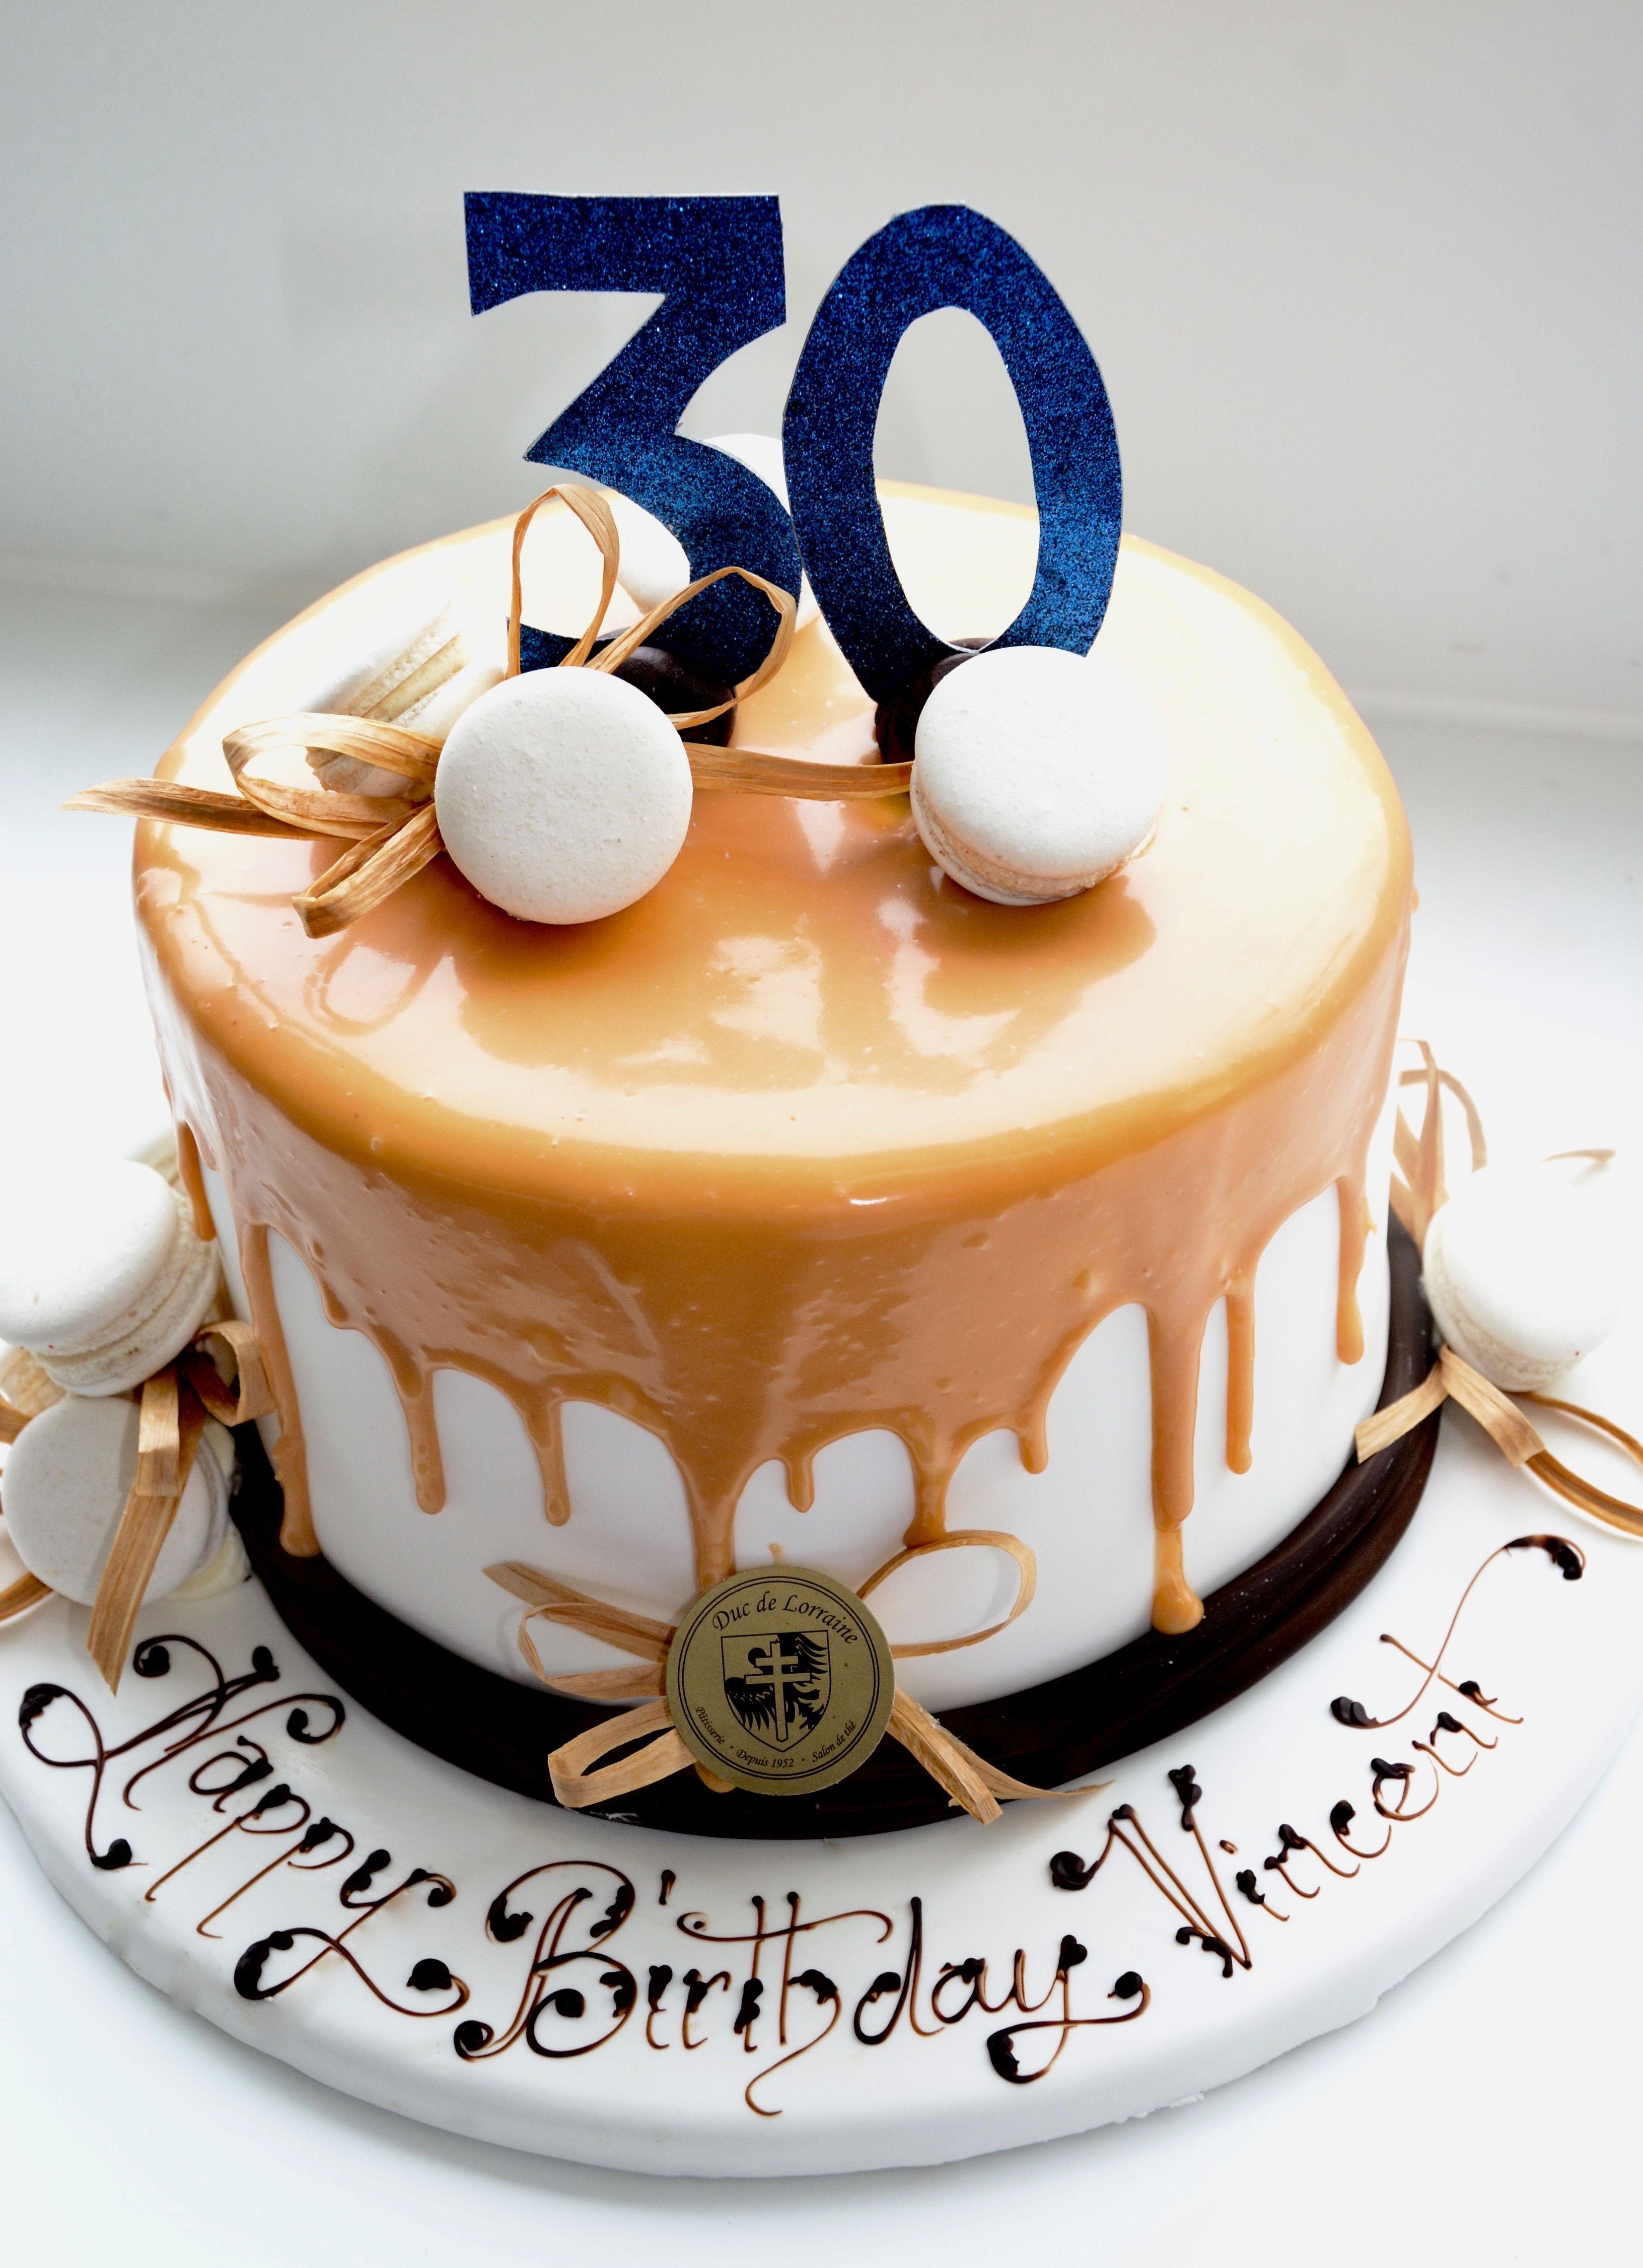 Marvelous Special Orders Custom Birthday Cakes Custom Cakes Cake Personalised Birthday Cards Veneteletsinfo